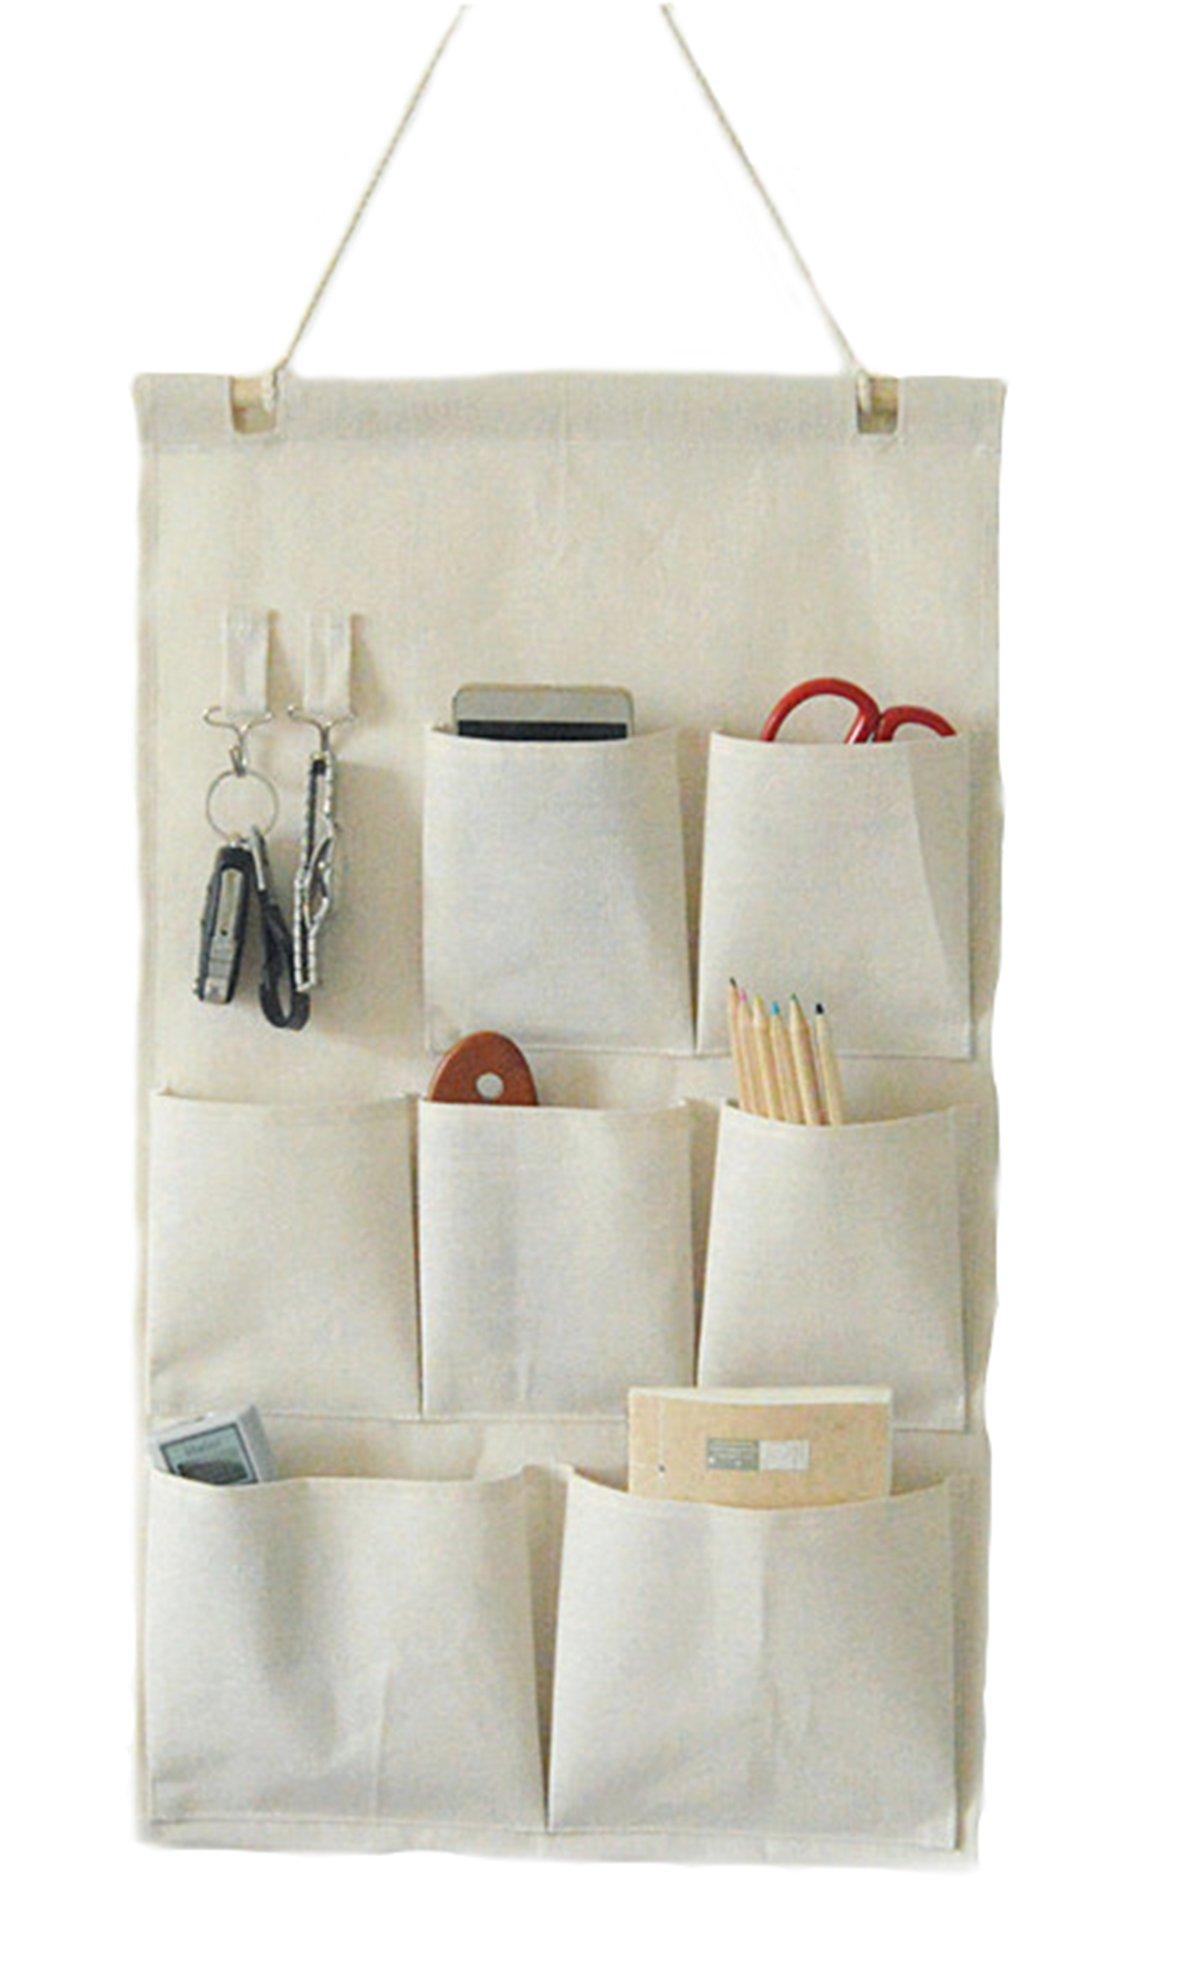 CaLeQi Linen/Cotton Fabric Wall Door Closet Hanging Storage Bag Case (7 Pockets)